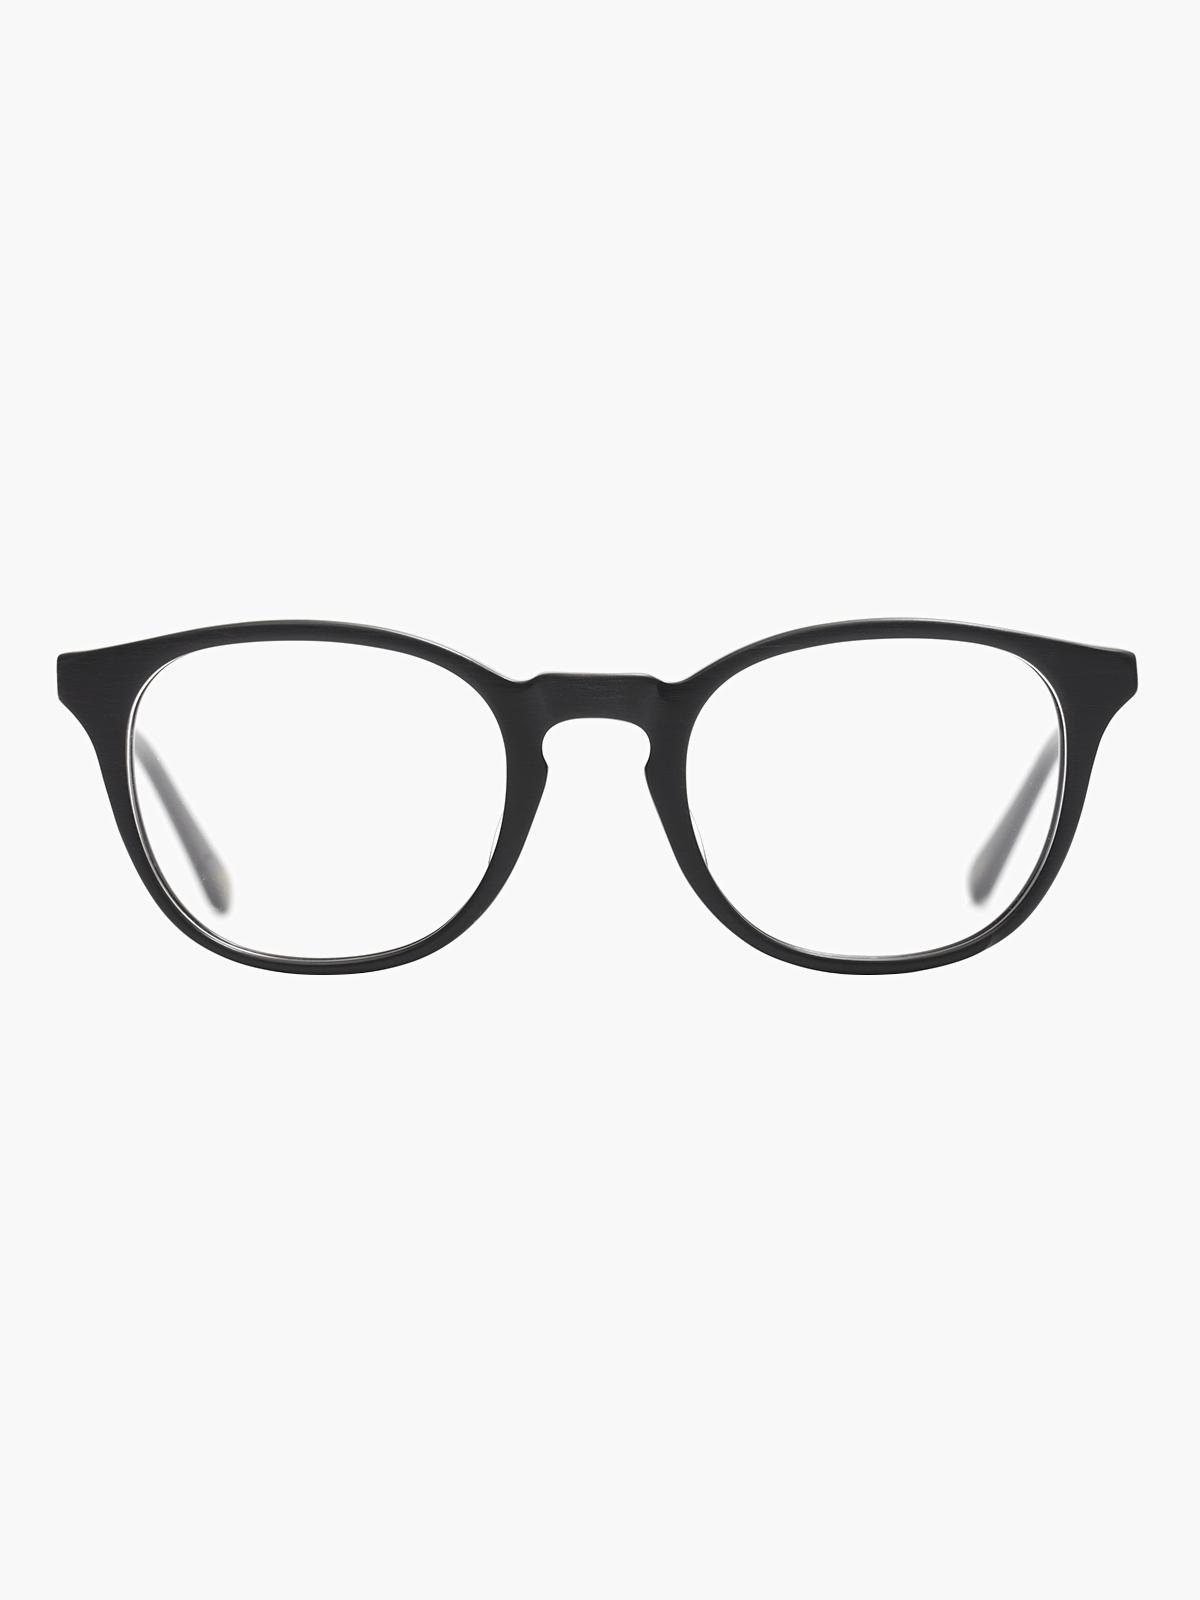 a42e972d5971 The Arthur | Eyewear Handcrafted in Japan | Archibald London